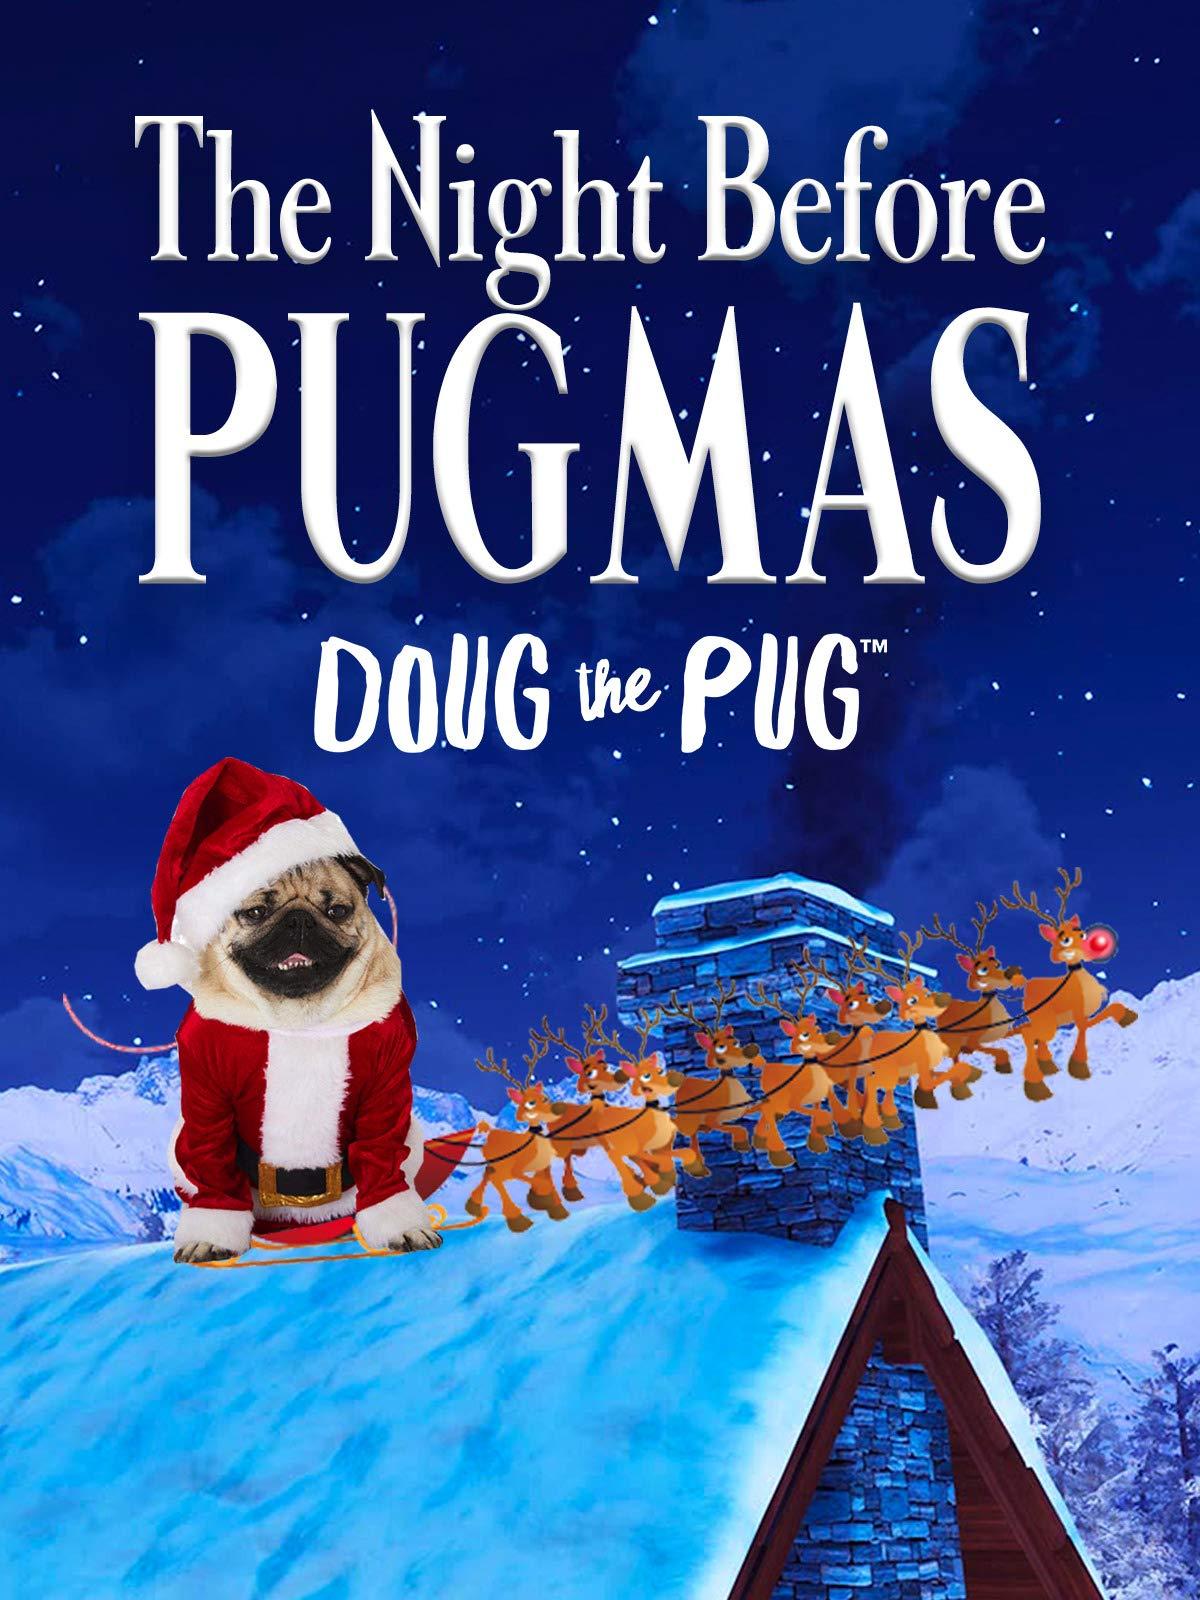 The Night Before Pugmas